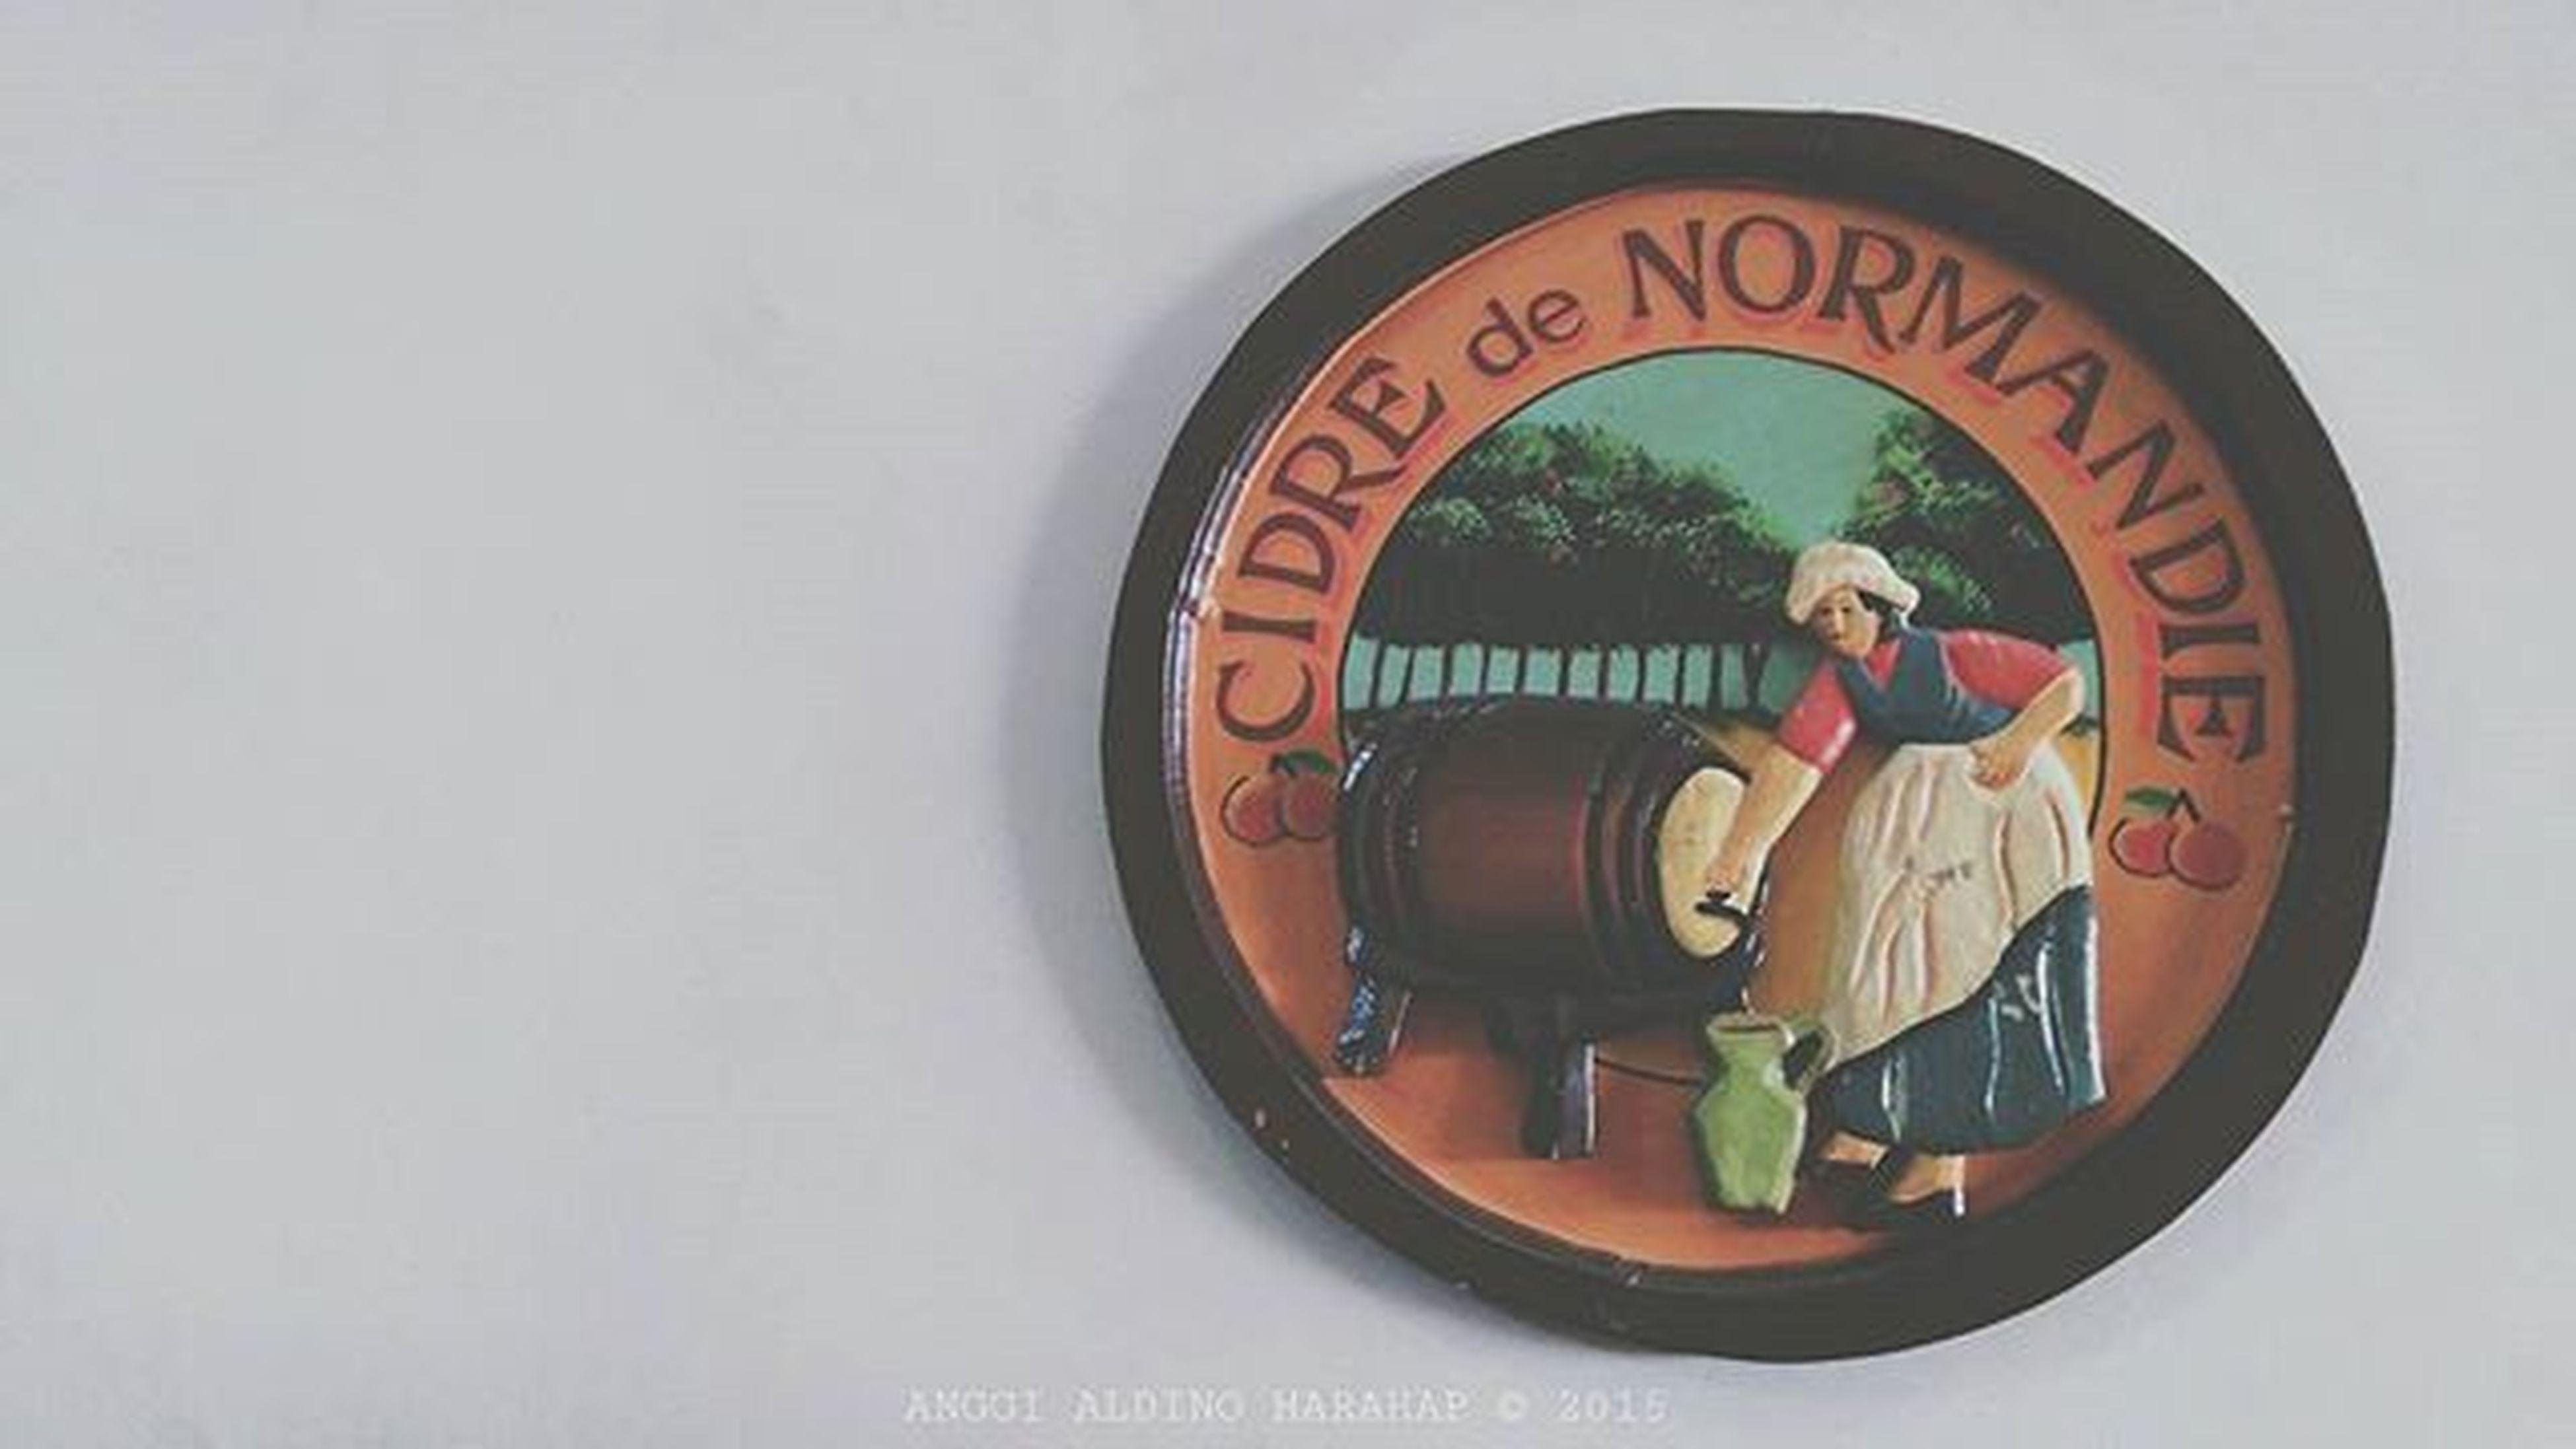 Cidre de Normandie VSCO Vscogrid Vscogood Vscophile Vscolover Vscocam Vscocamphotos Cidredenormandie